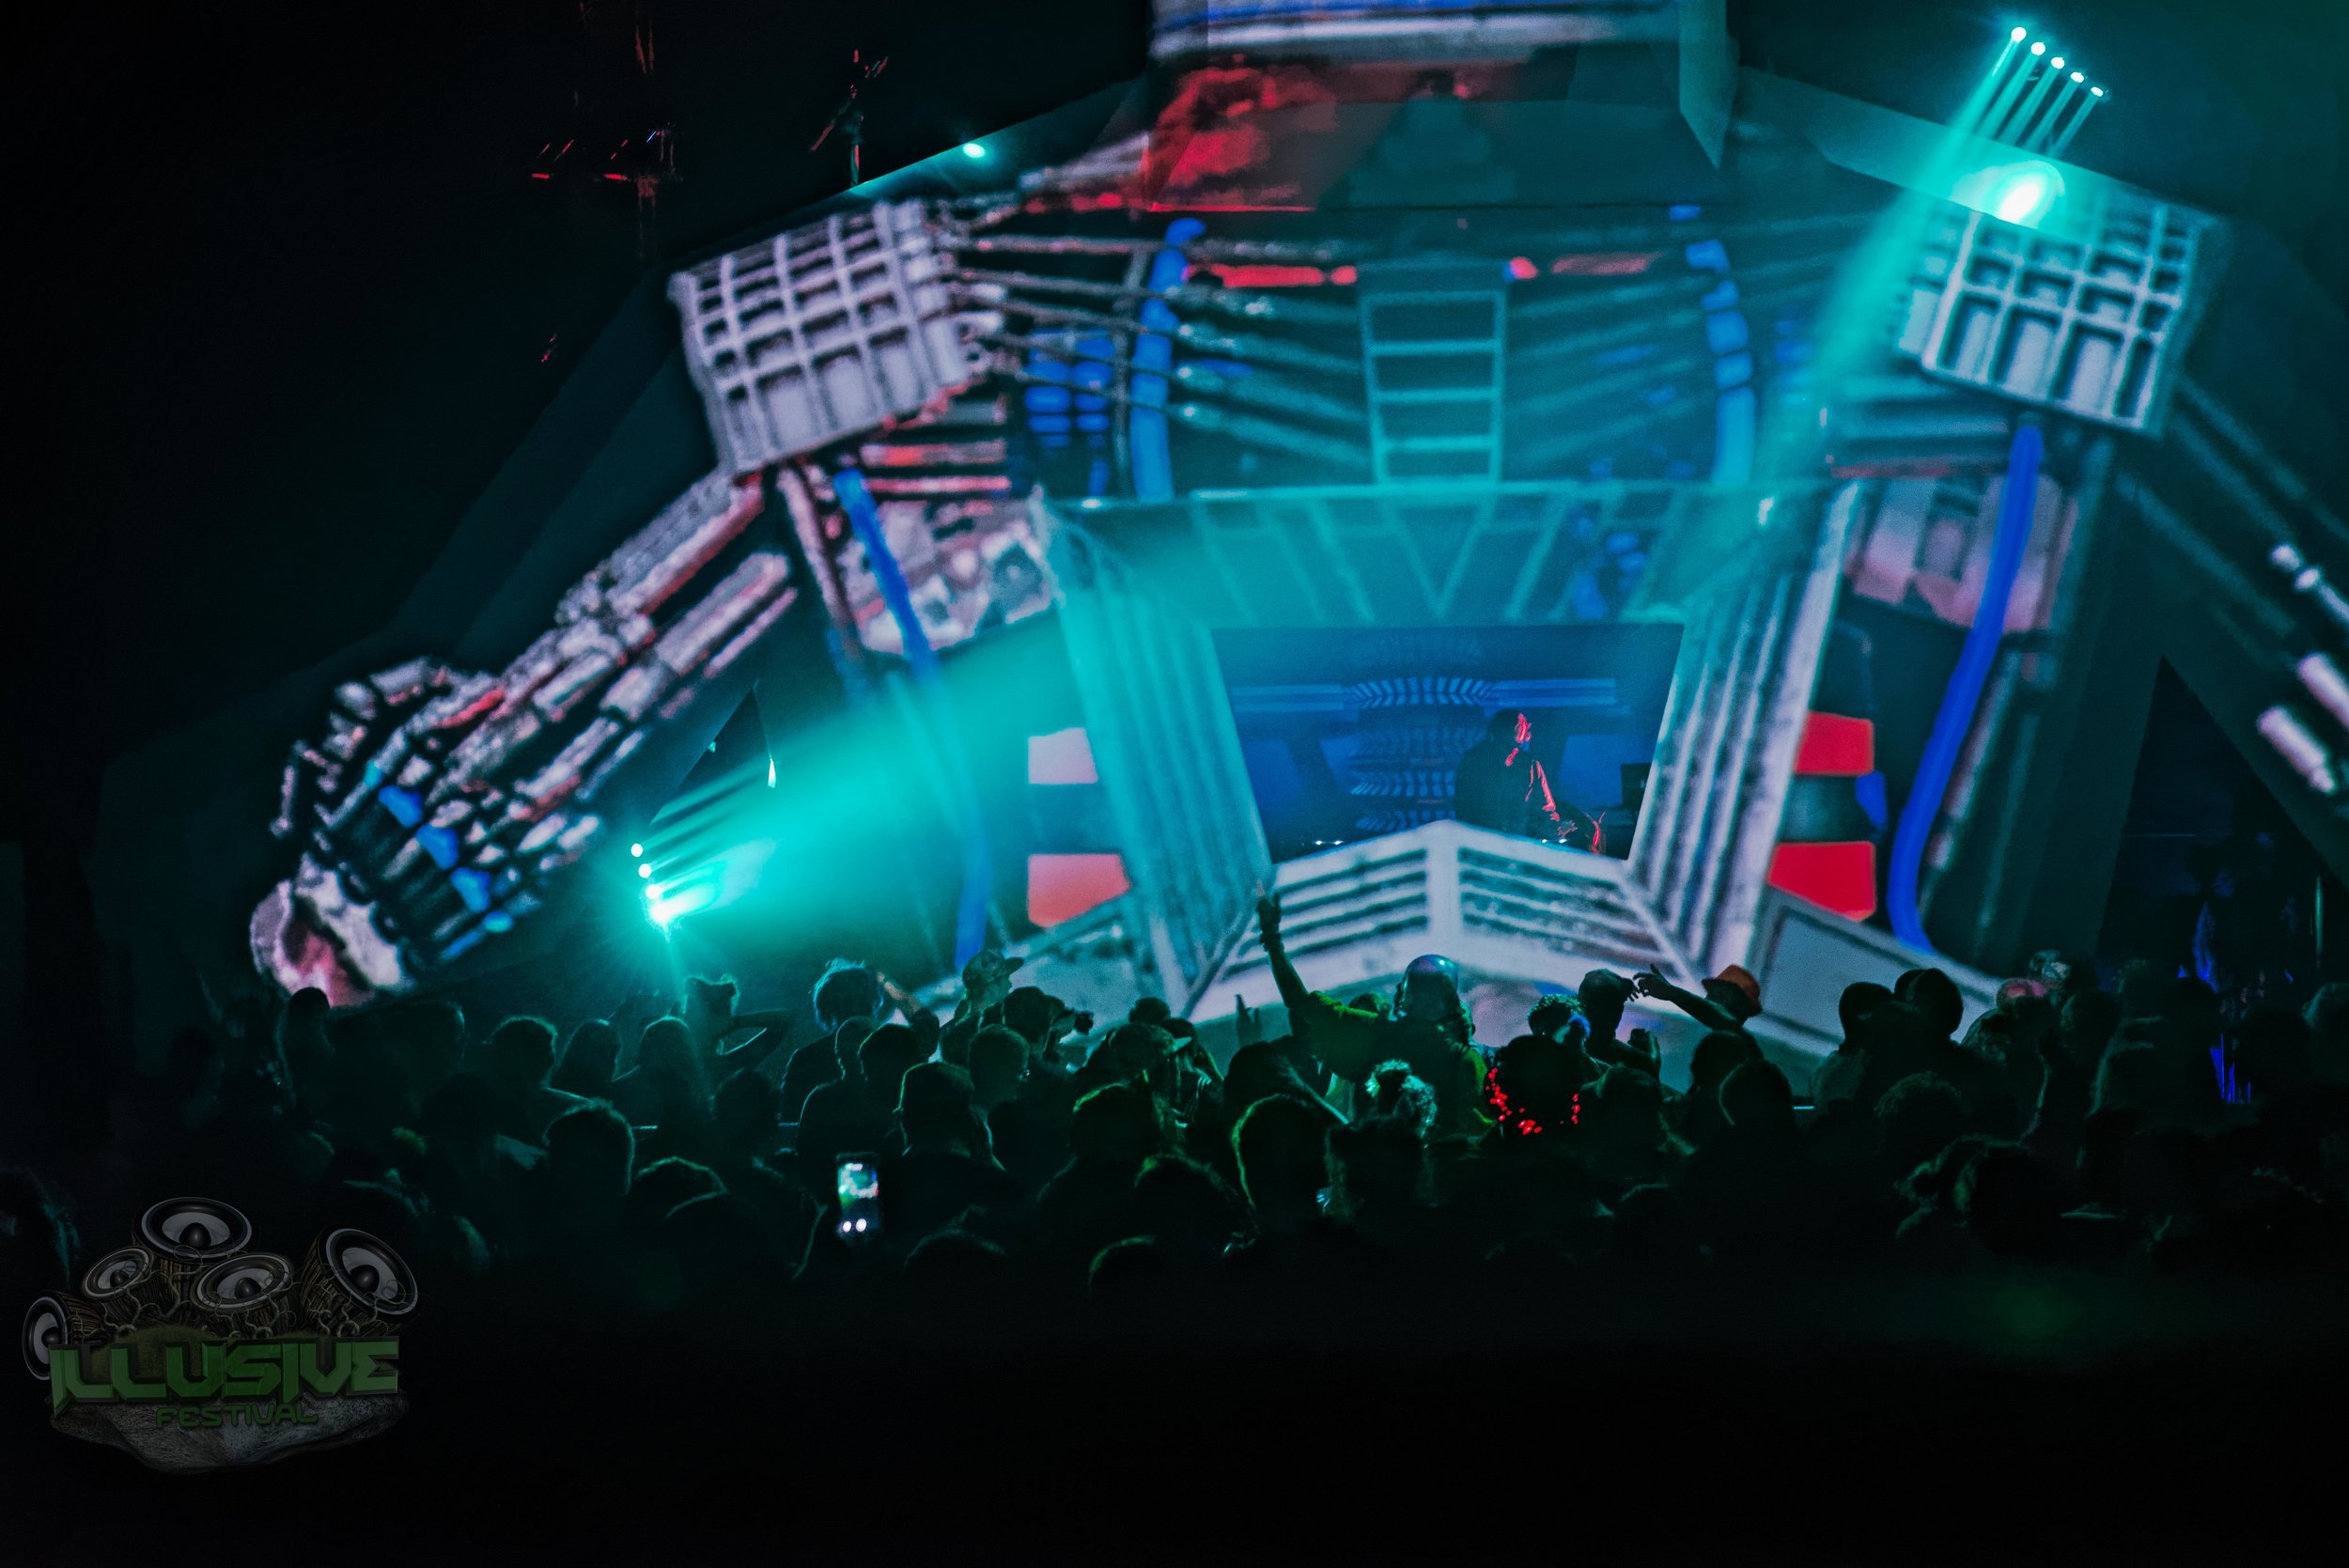 Robot festival stage lit in blue.